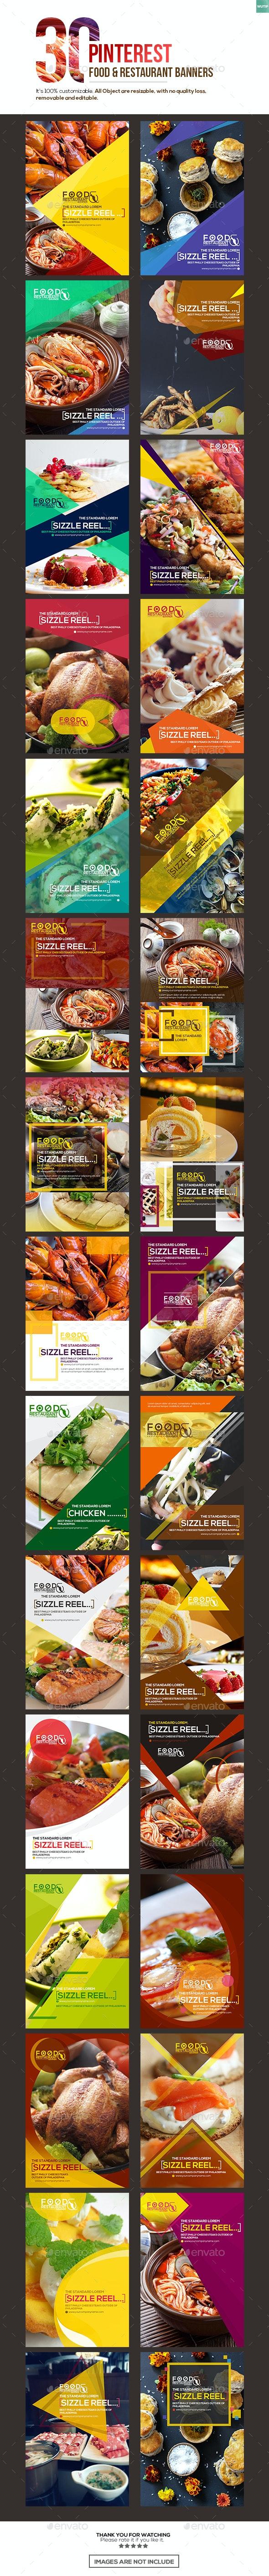 30 Pinterest Food & Restaurant Banners - Banners & Ads Web Elements